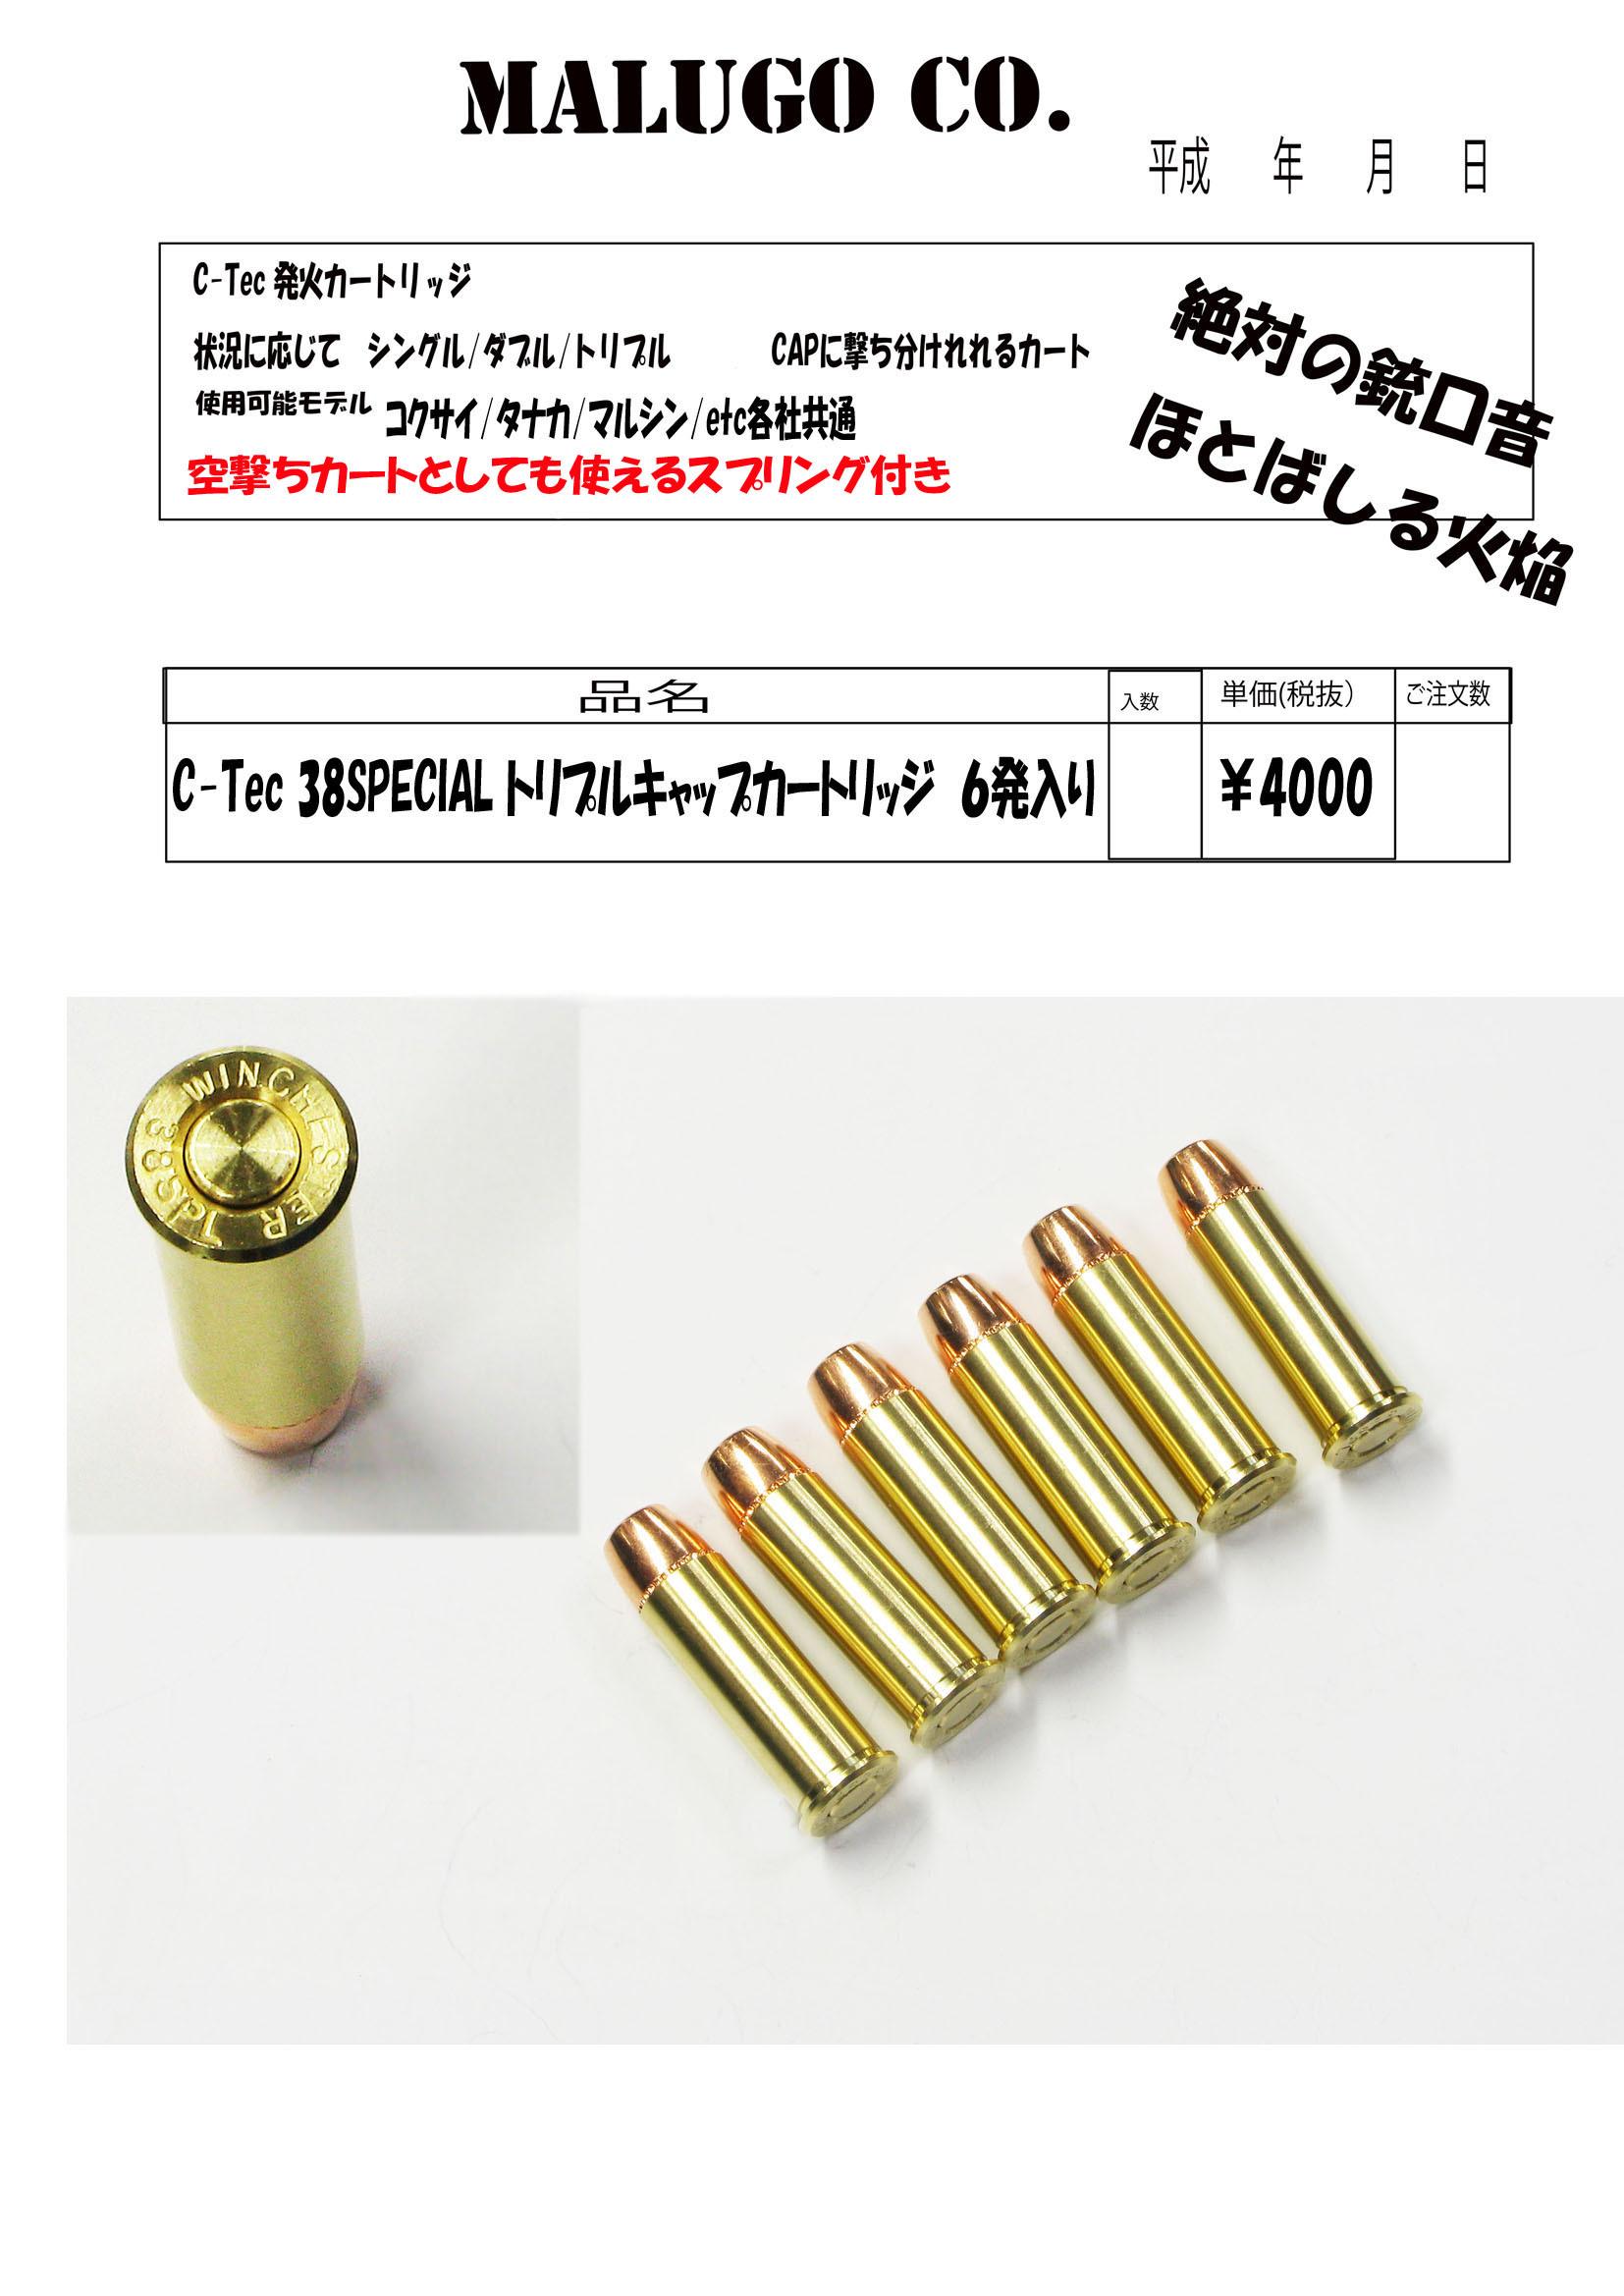 C-Tec .38SPL  トリプルキャップカート_f0131995_11253199.jpg